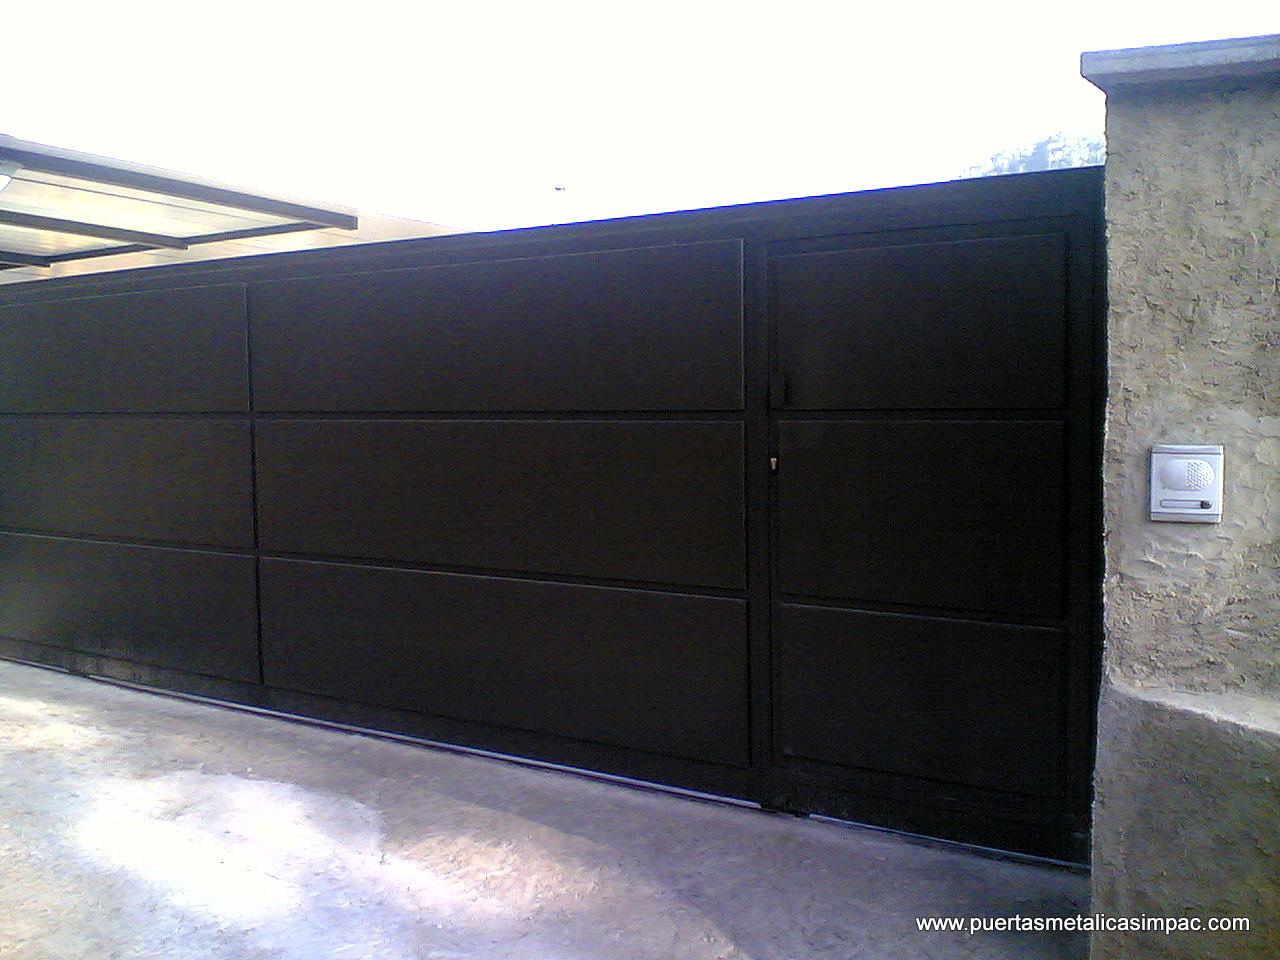 Cerrajeria impac s p c puertas met licas fabricaci n for Puertas corredizas metalicas